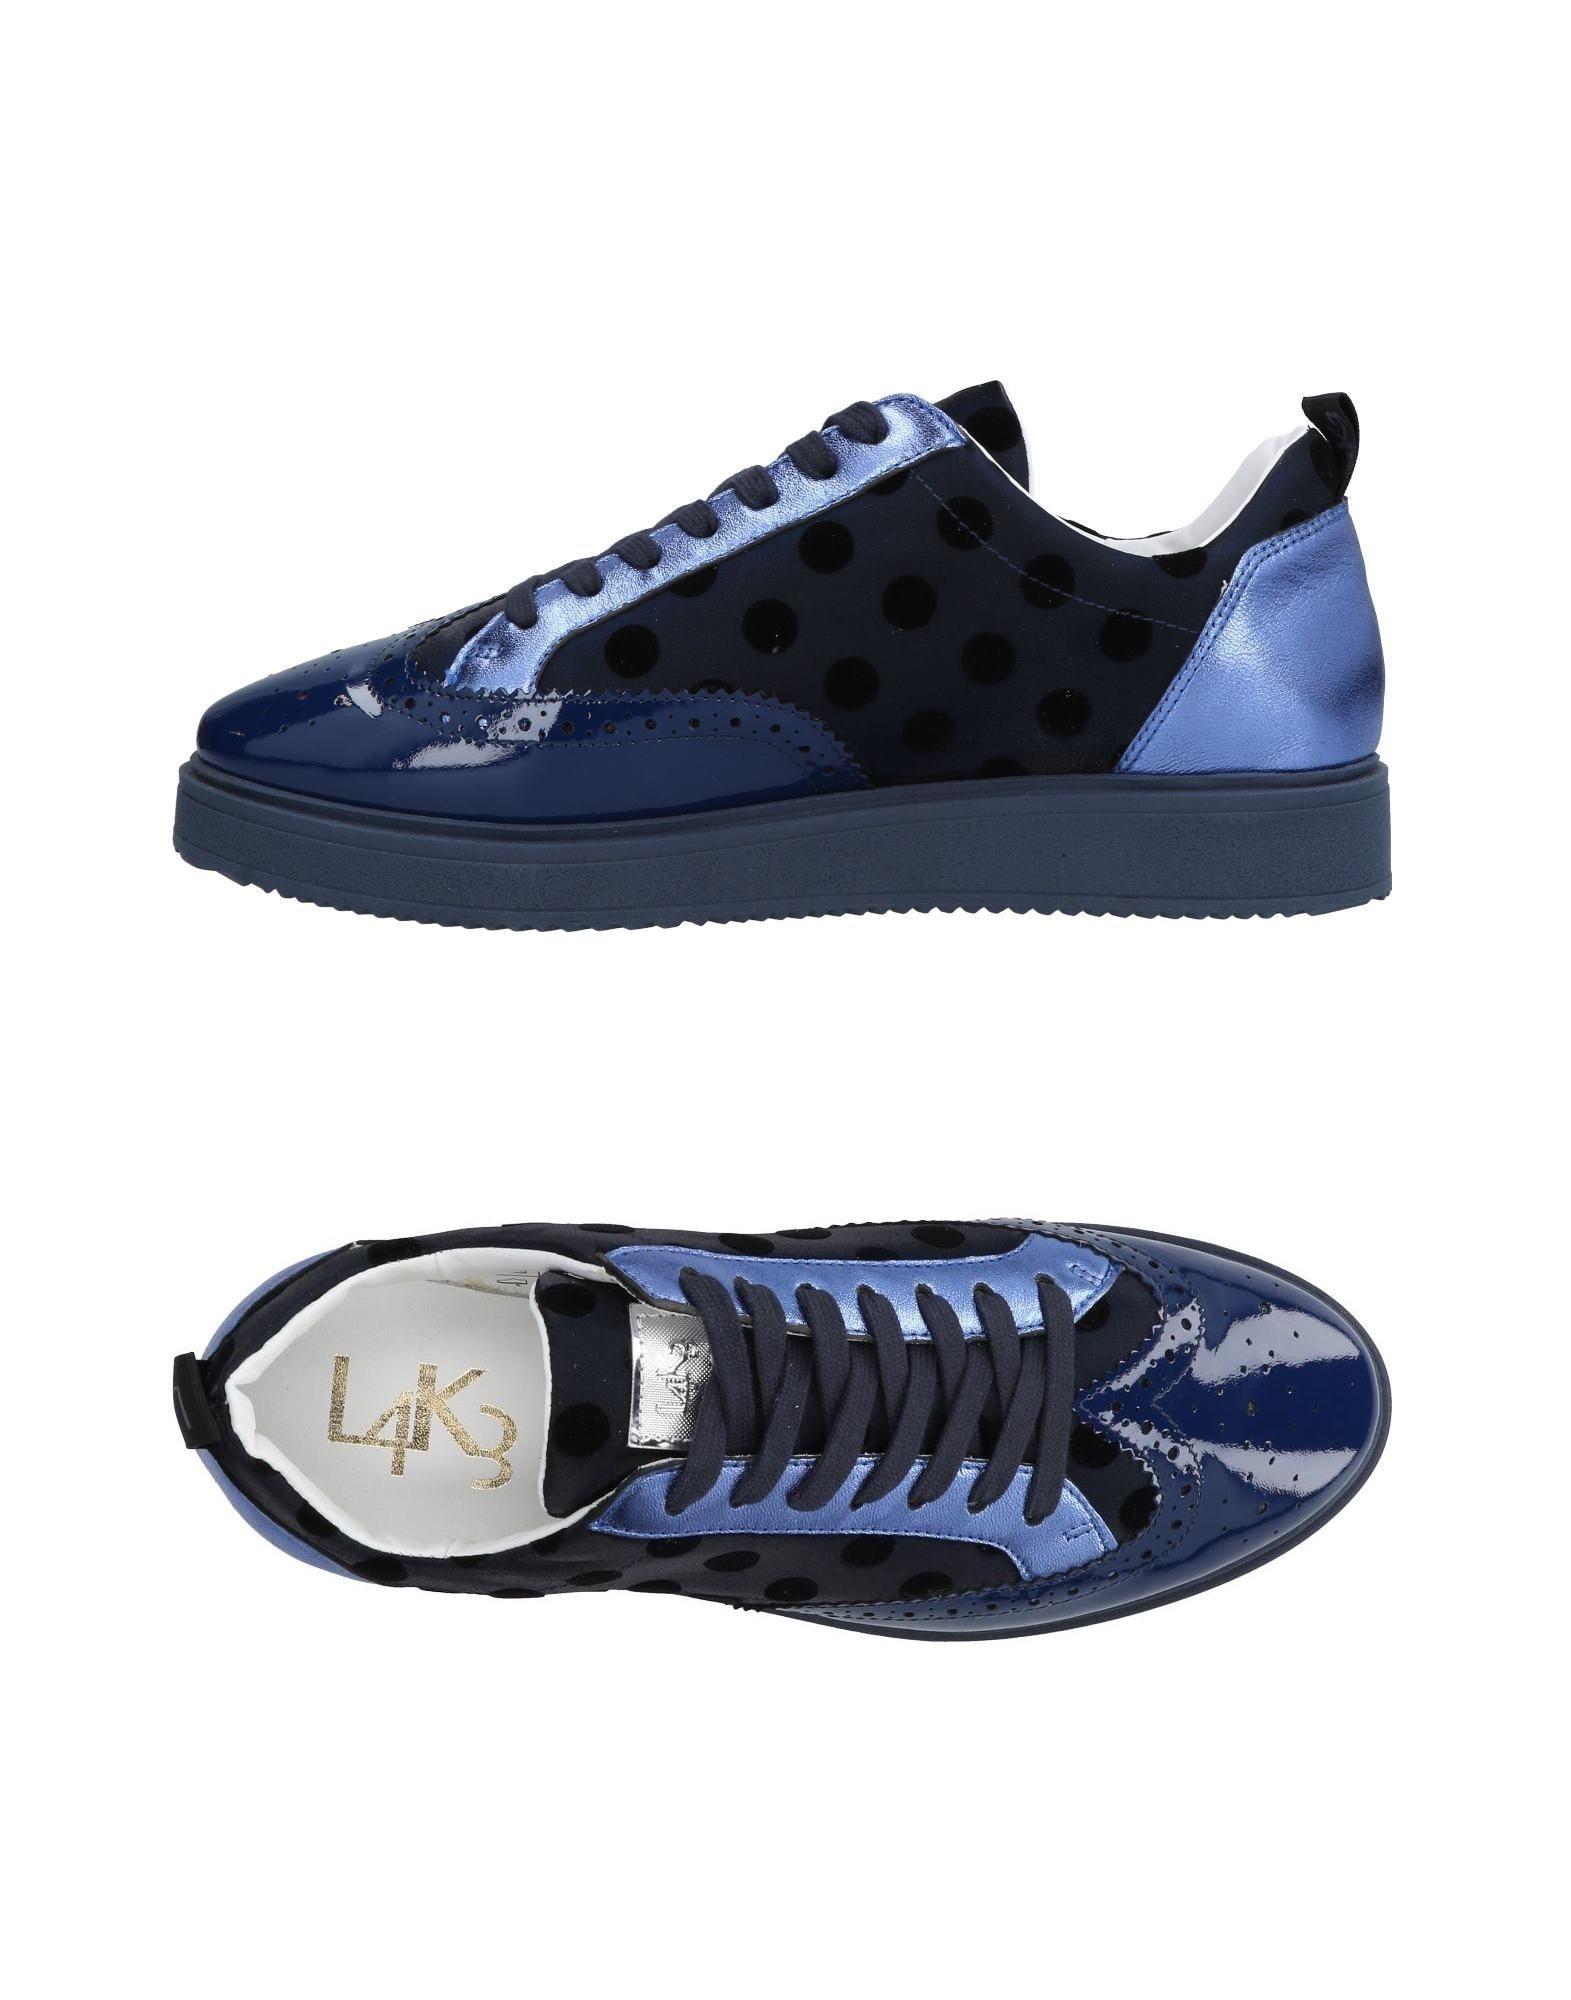 L4k3 Sneakers Damen  11486172DB